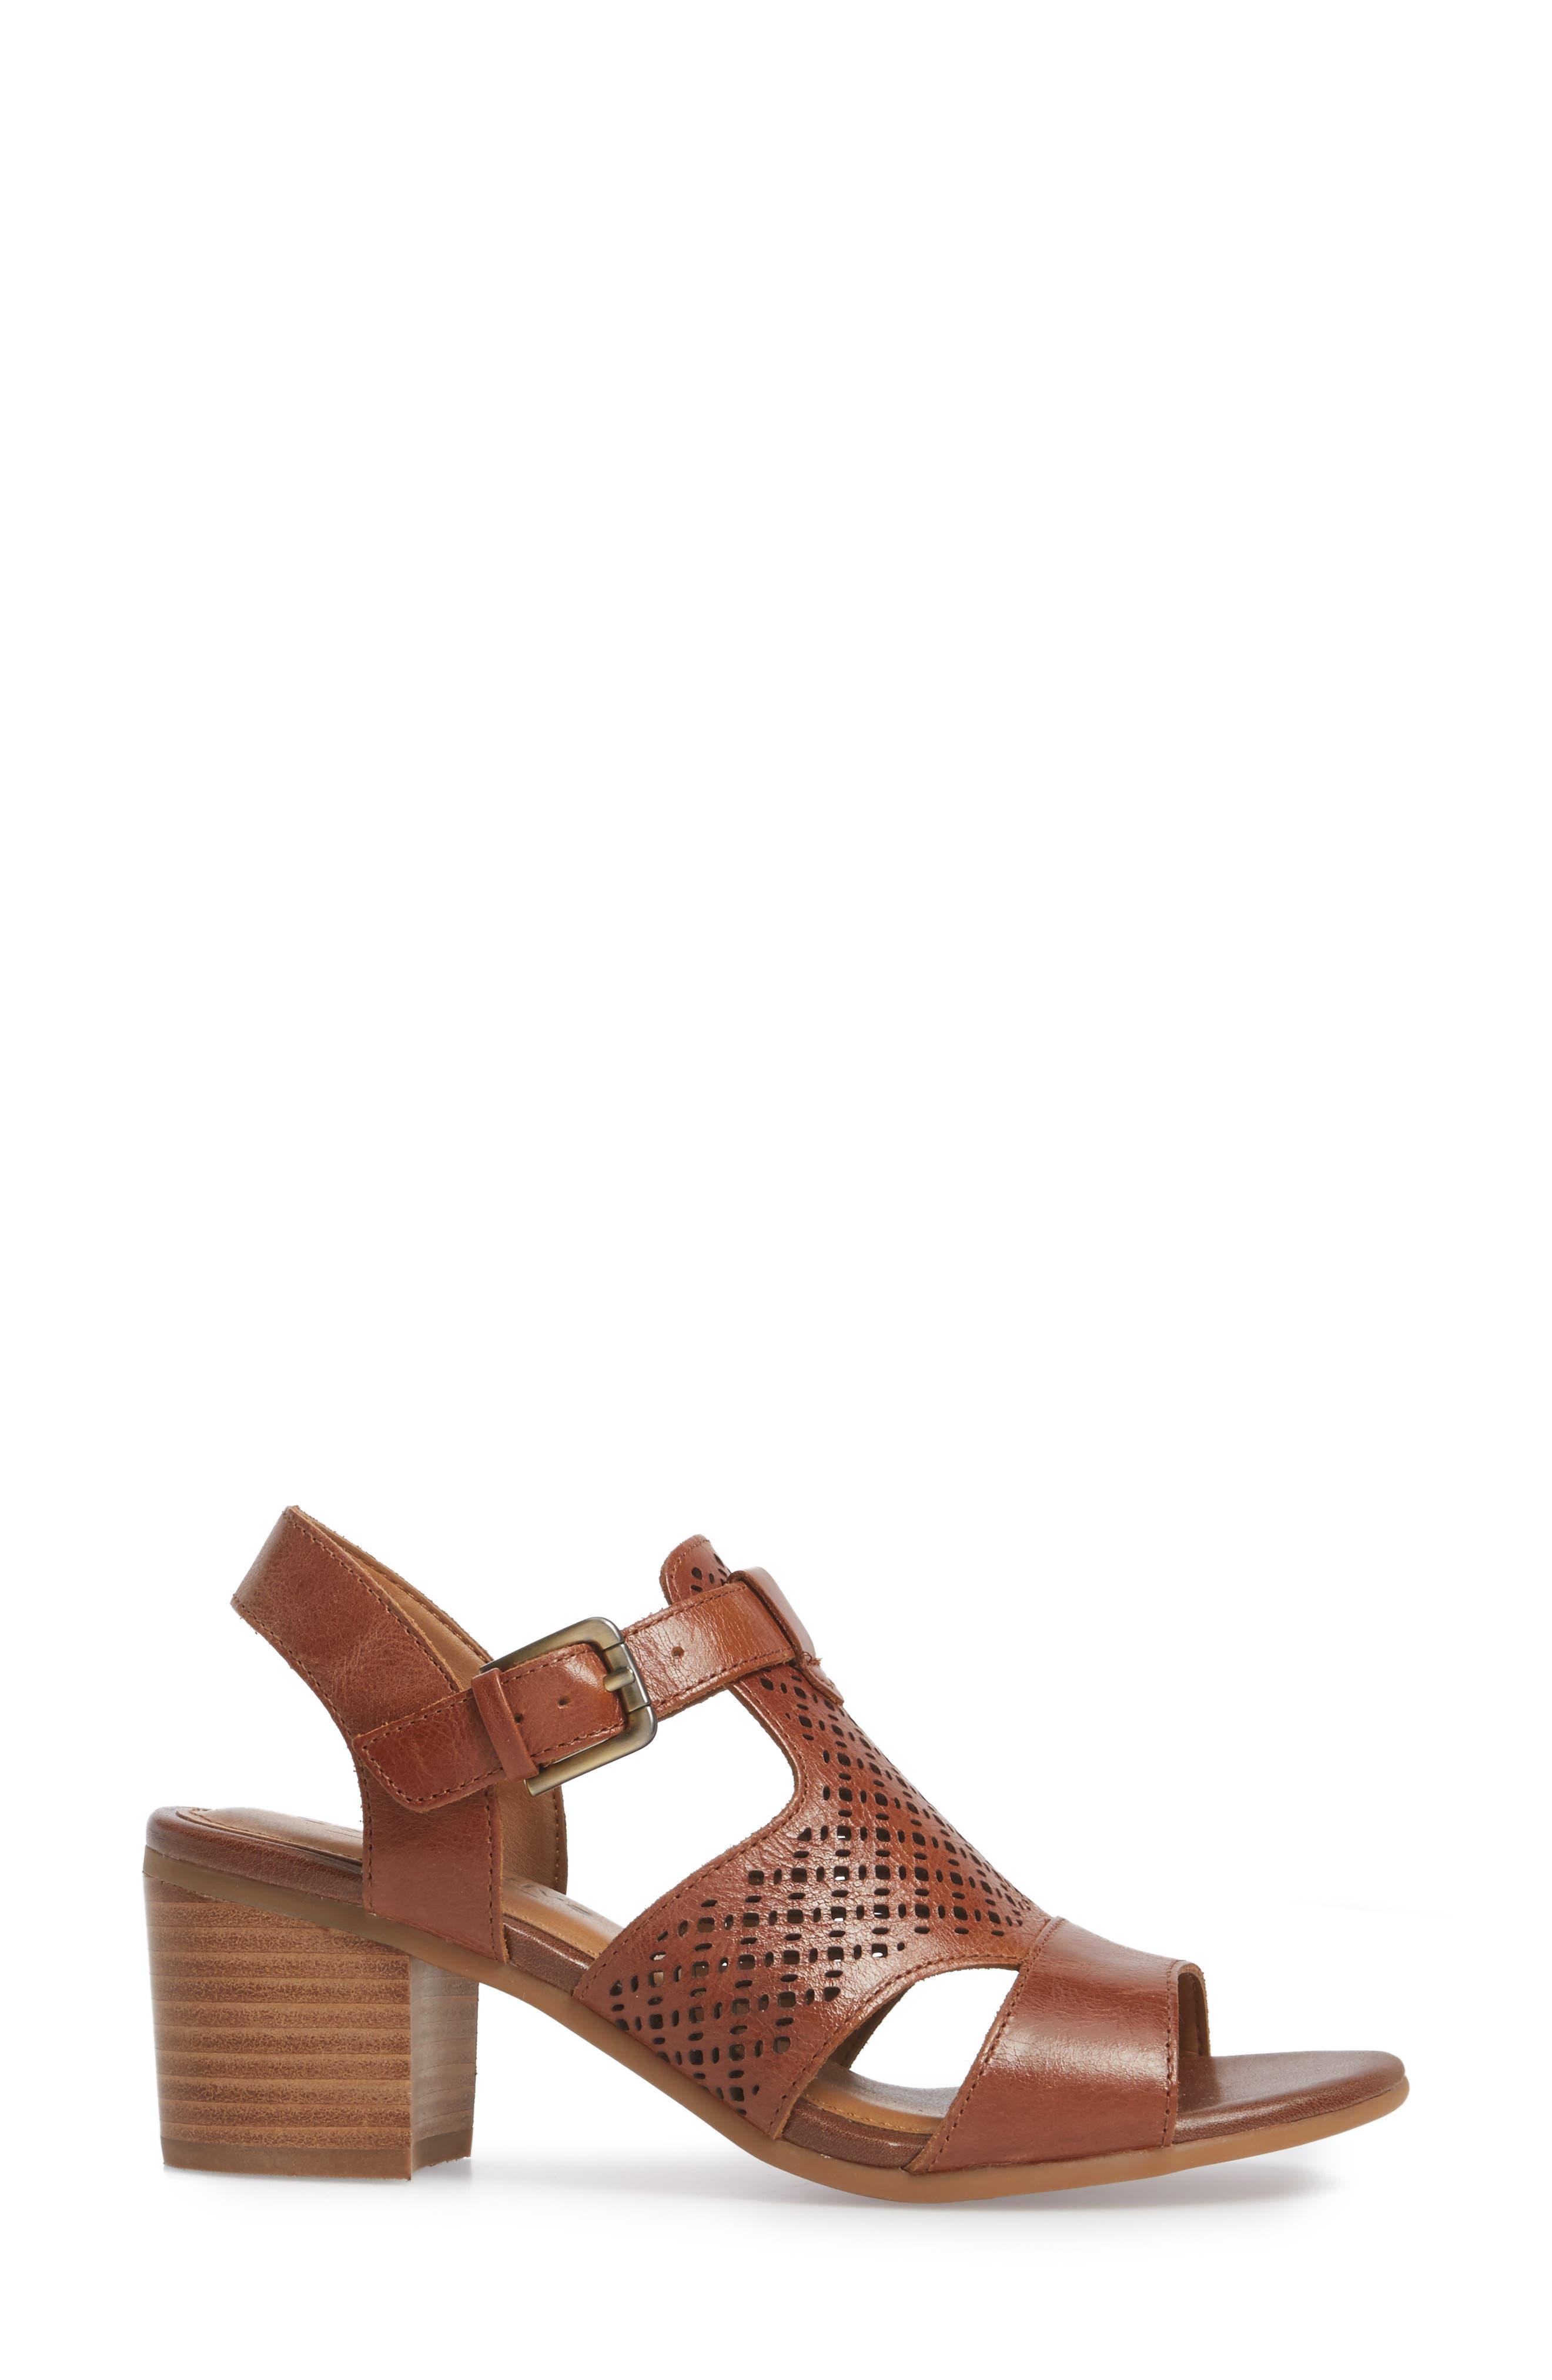 Amber Perforated Block Heel Sandal,                             Alternate thumbnail 3, color,                             Luggage Leather